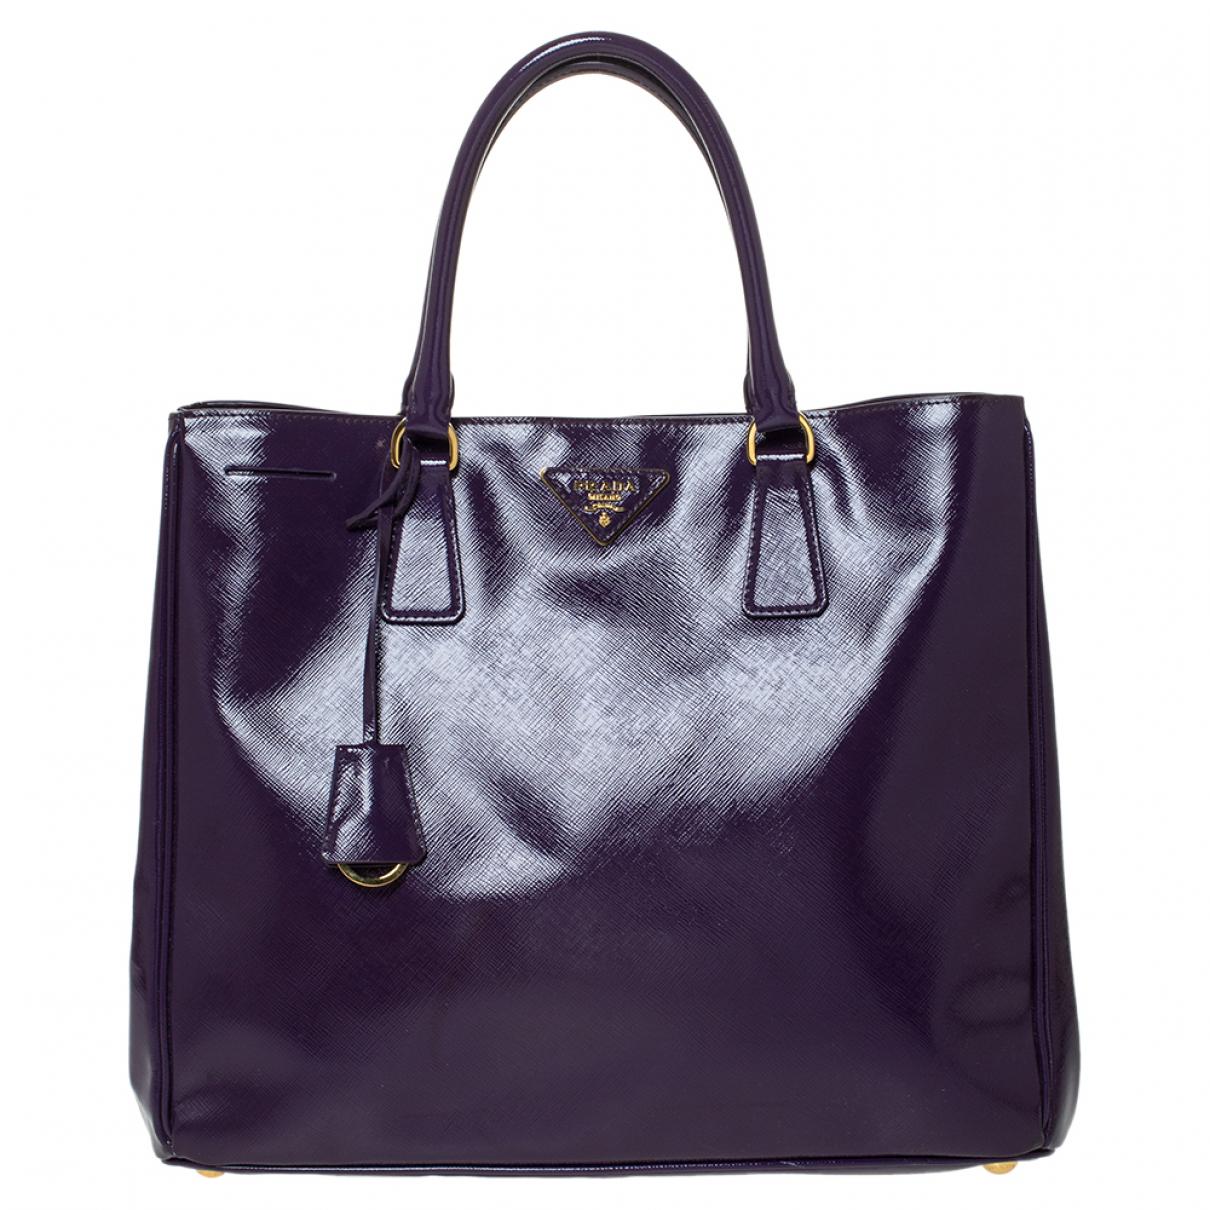 Prada N Purple Patent leather handbag for Women N